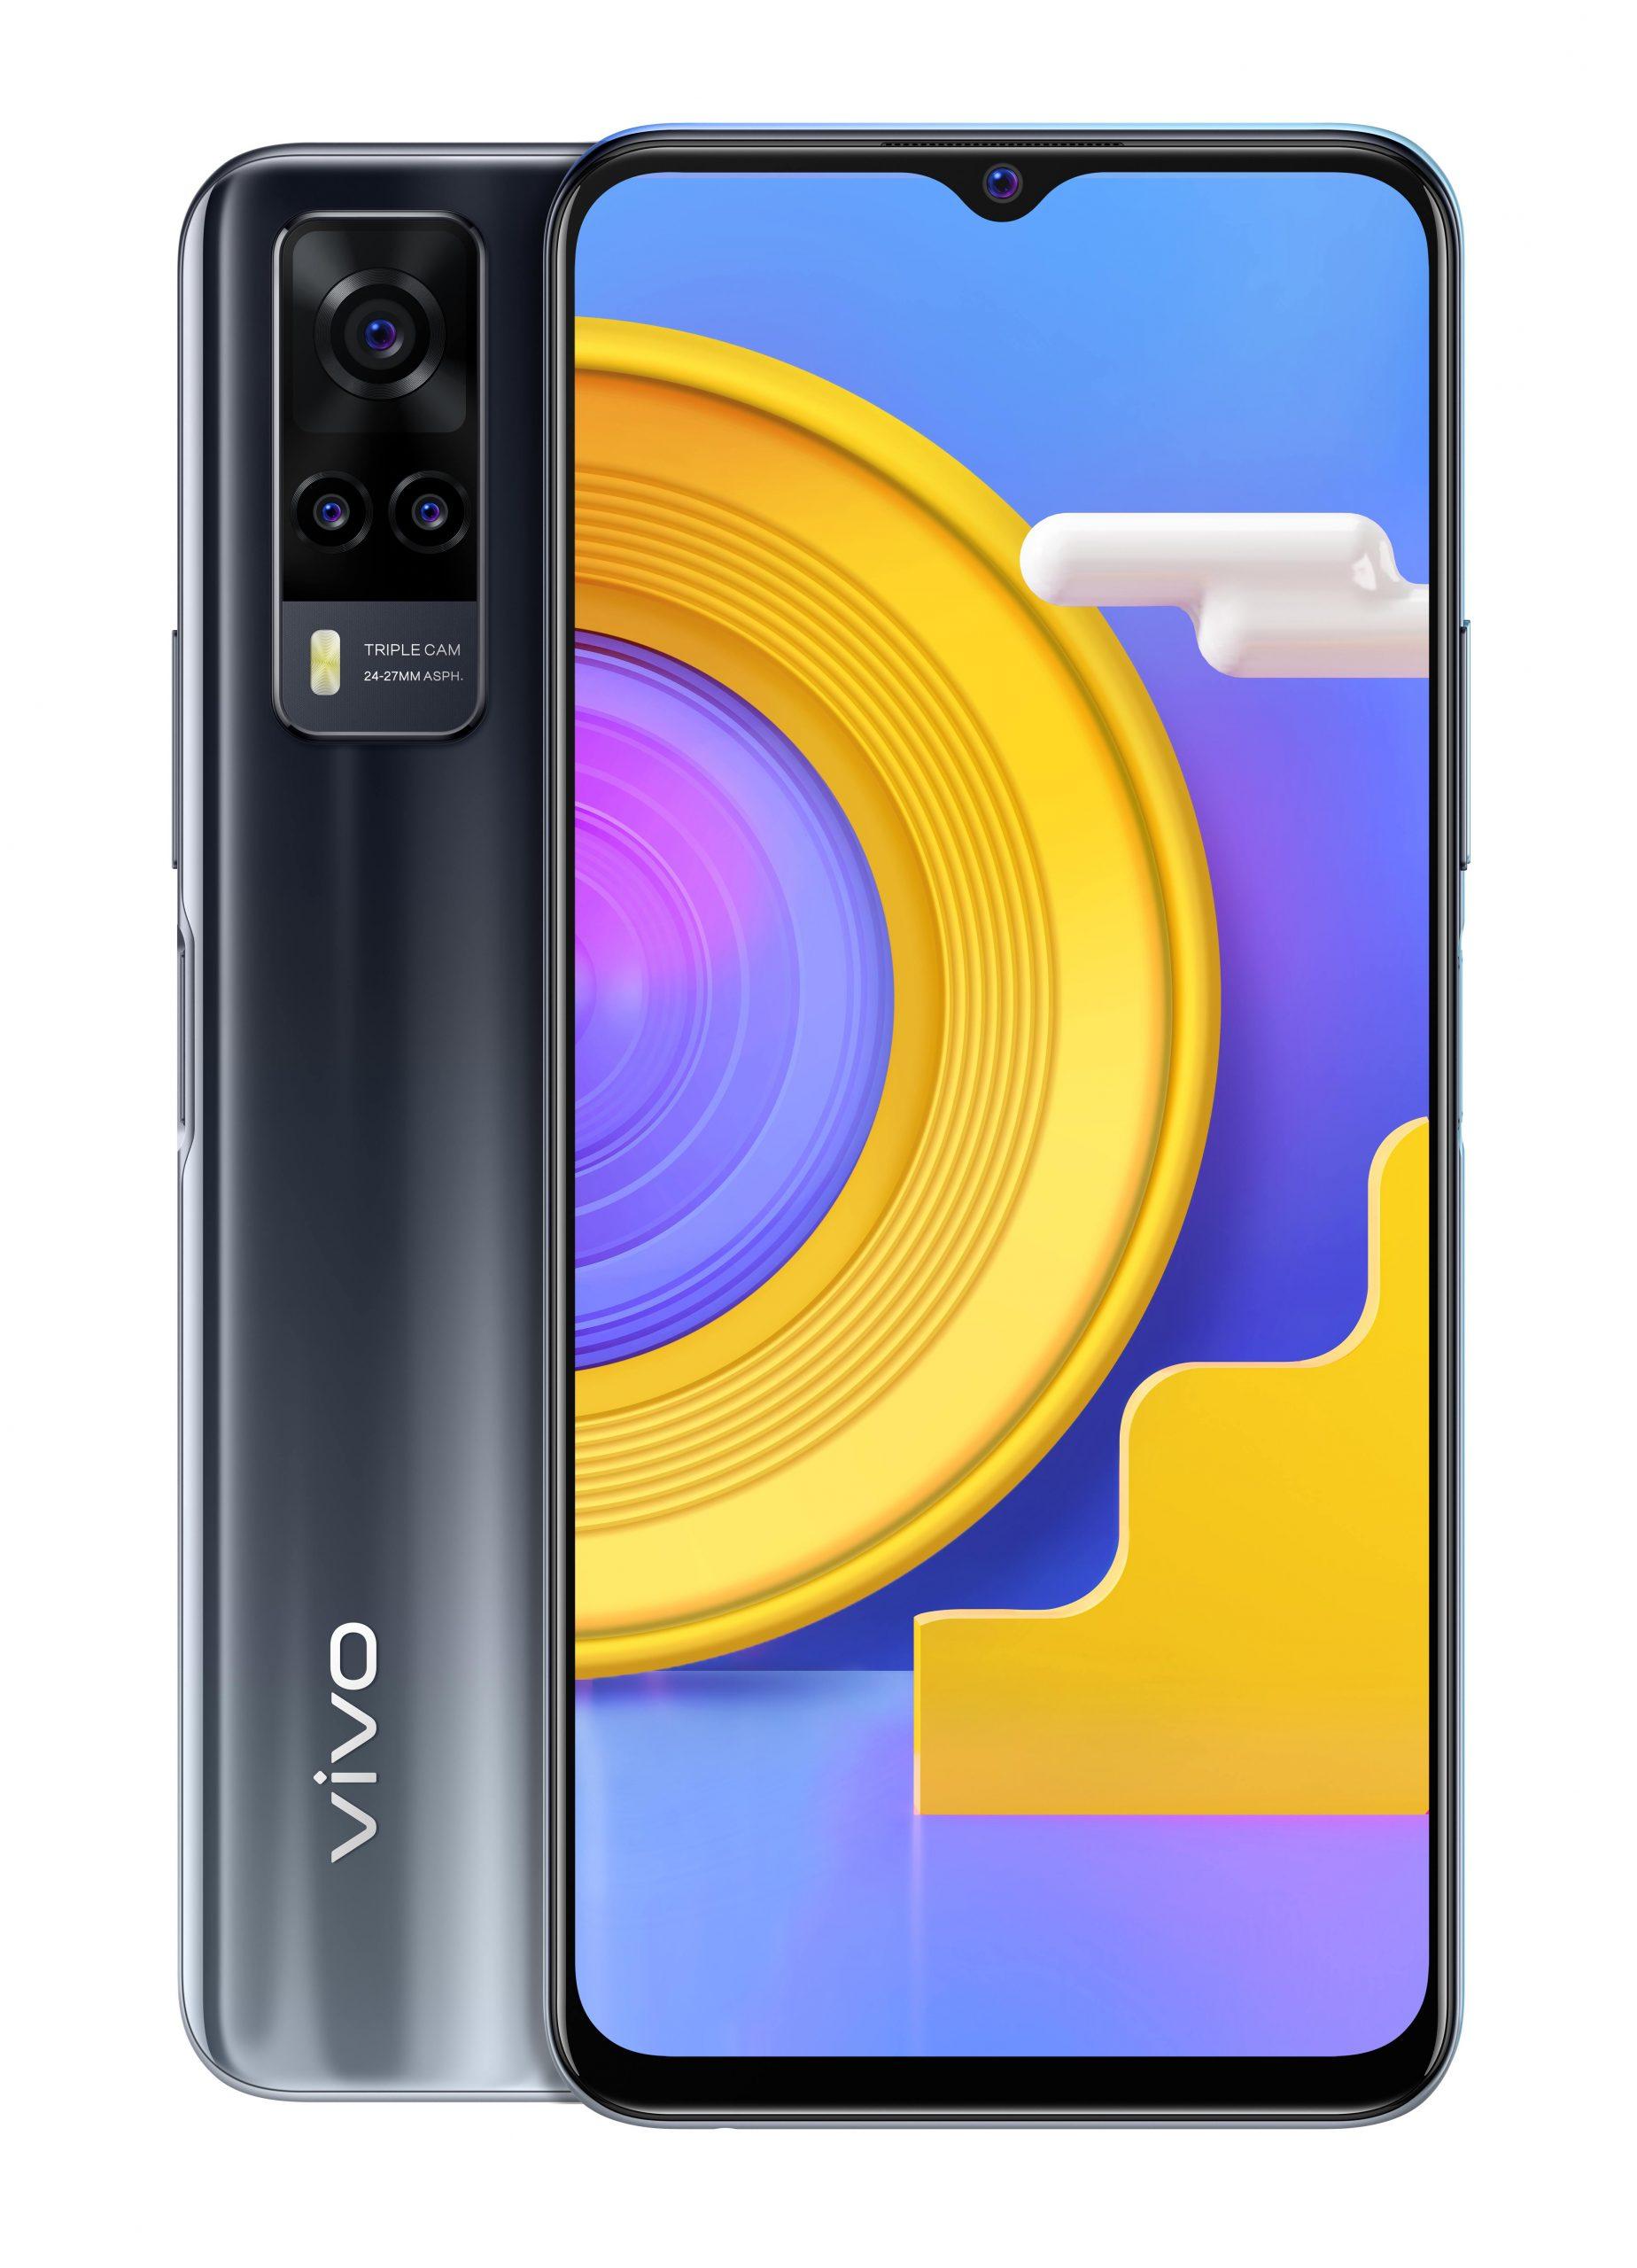 vivo launches Y31 with 48MP AI Triple Camera